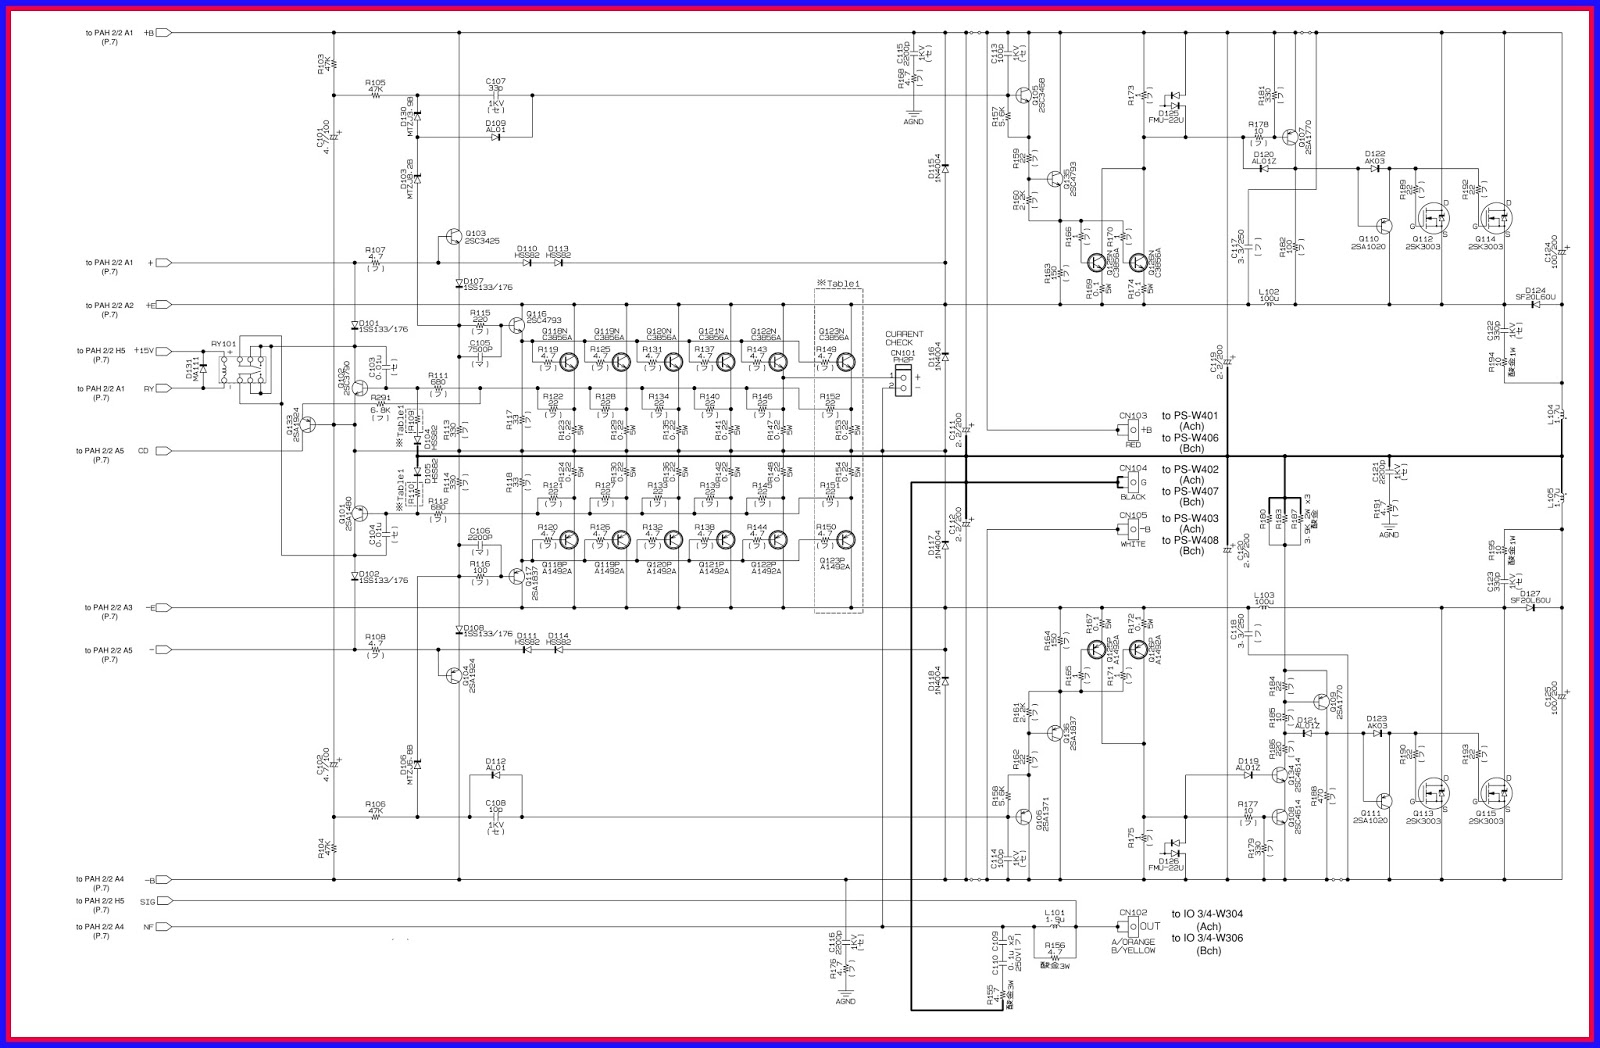 yamaha amp schematic wiring diagram megayamaha amp schematic wiring diagram yamaha amp schematics yamaha amp schematic [ 1600 x 1048 Pixel ]